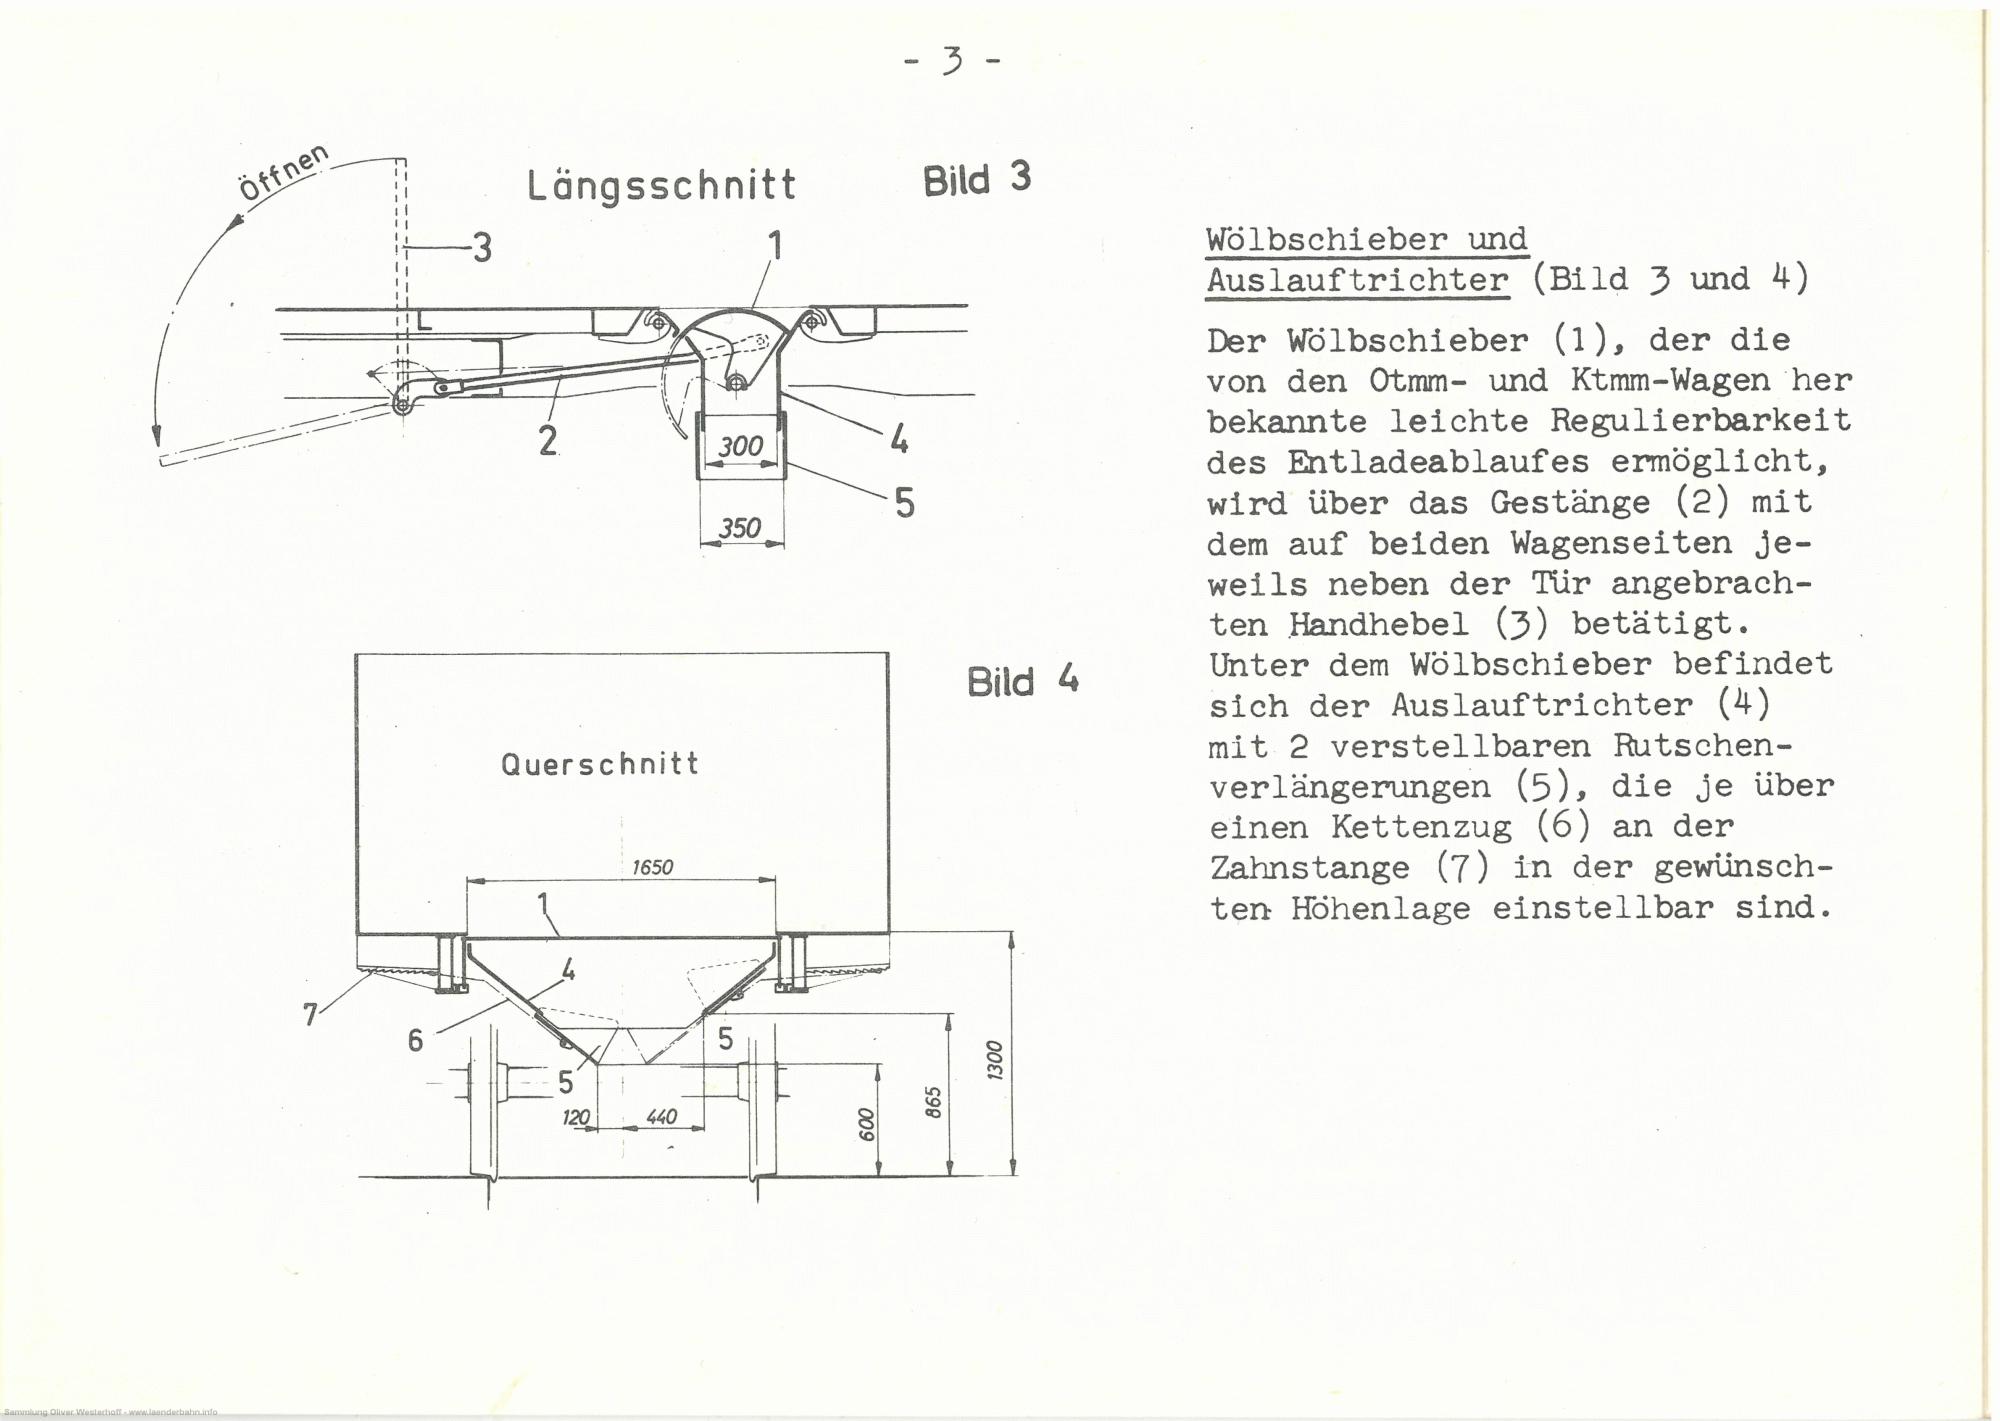 https://www.laenderbahn.info/hifo/20181008/ommv72_seite_0007.png